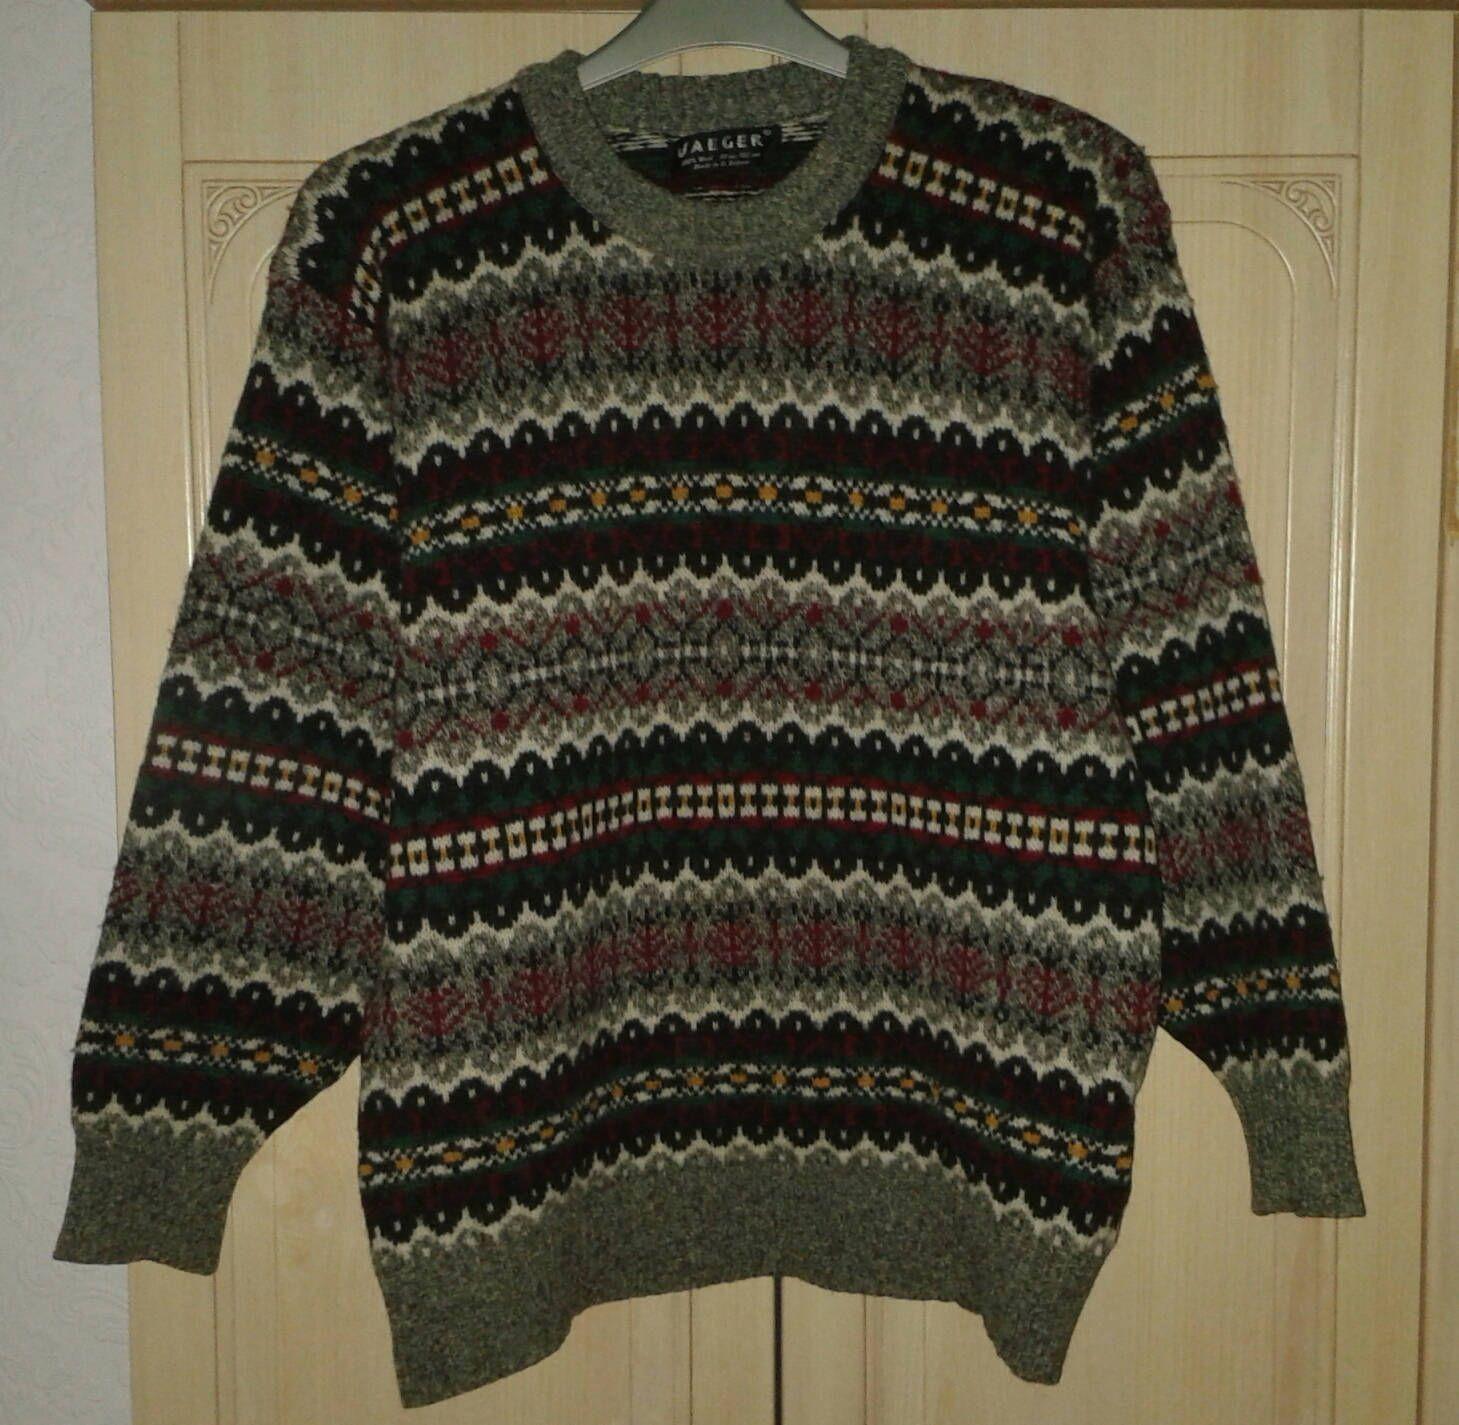 1d579a41ac7 Pin by - ̗̀𝒾𝓃𝒹𝒾 ̖́- on •clothes• in 2019   Sweaters, Vintage ...